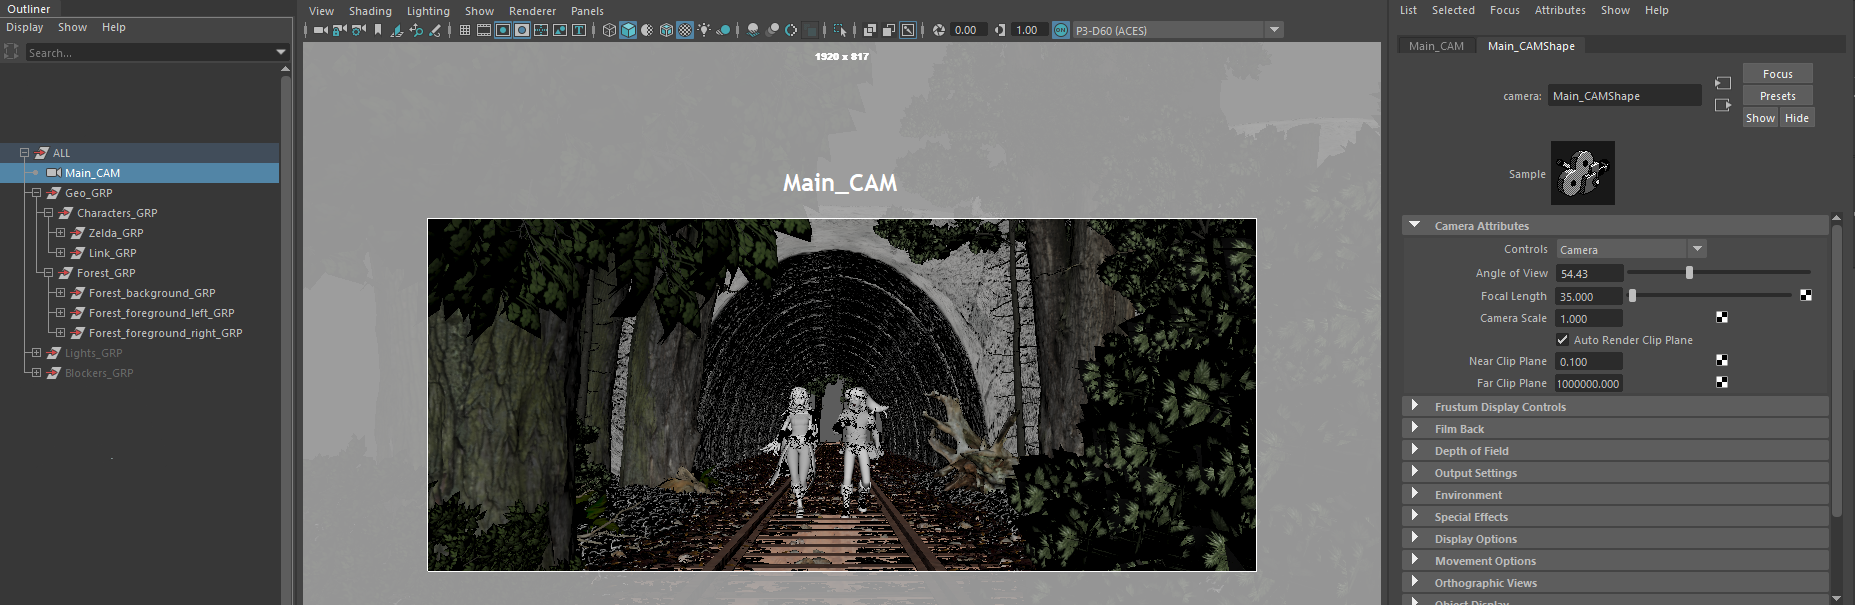 EX01_TheForest_JoanPons_Screenshot_02_CAM